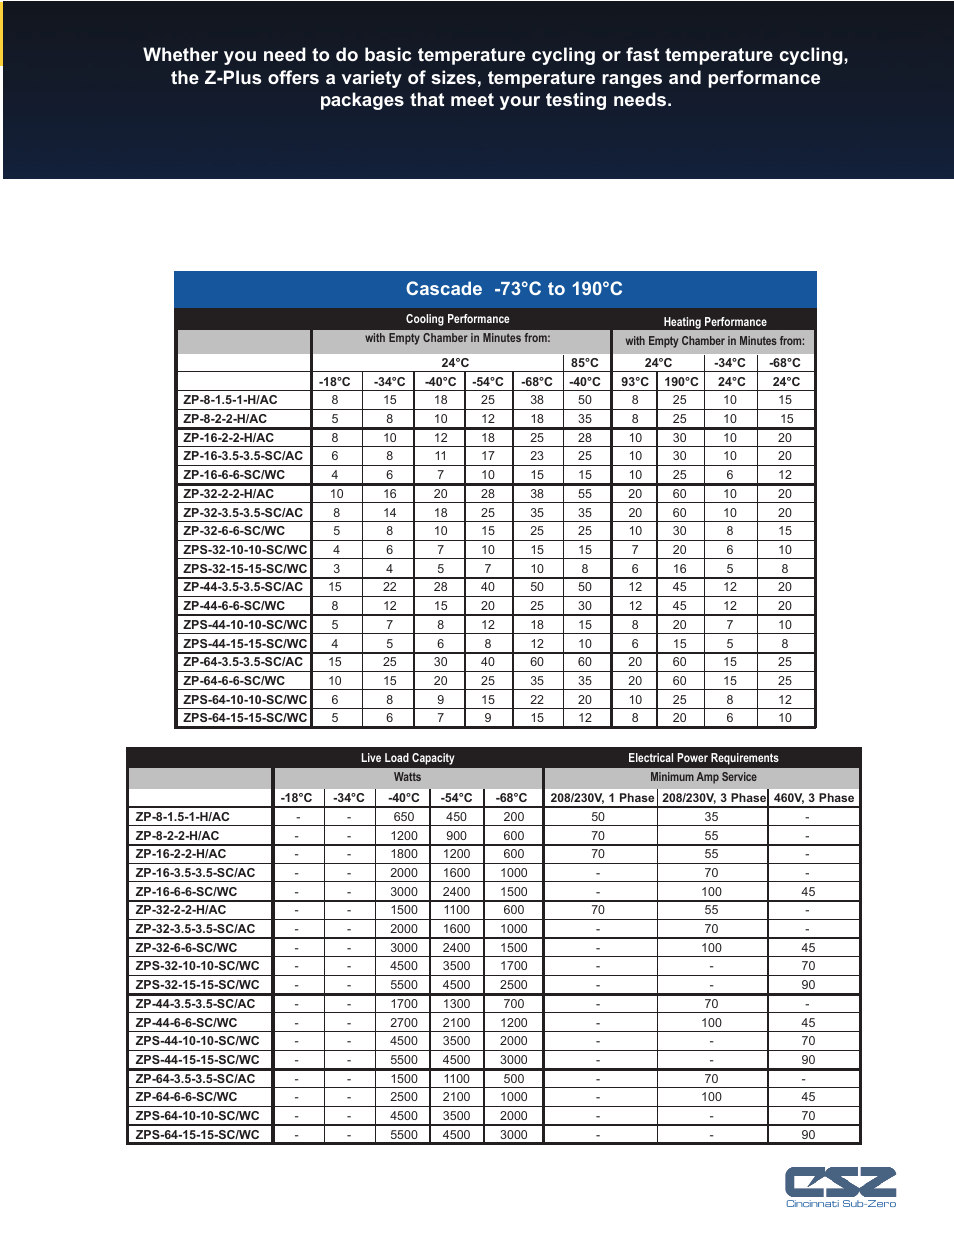 atec cincinnati sub zero z series user manual page 9 10 rh manualsdir com Sub-Zero 650 Manual Drawers Sub-Zero Replacement Parts